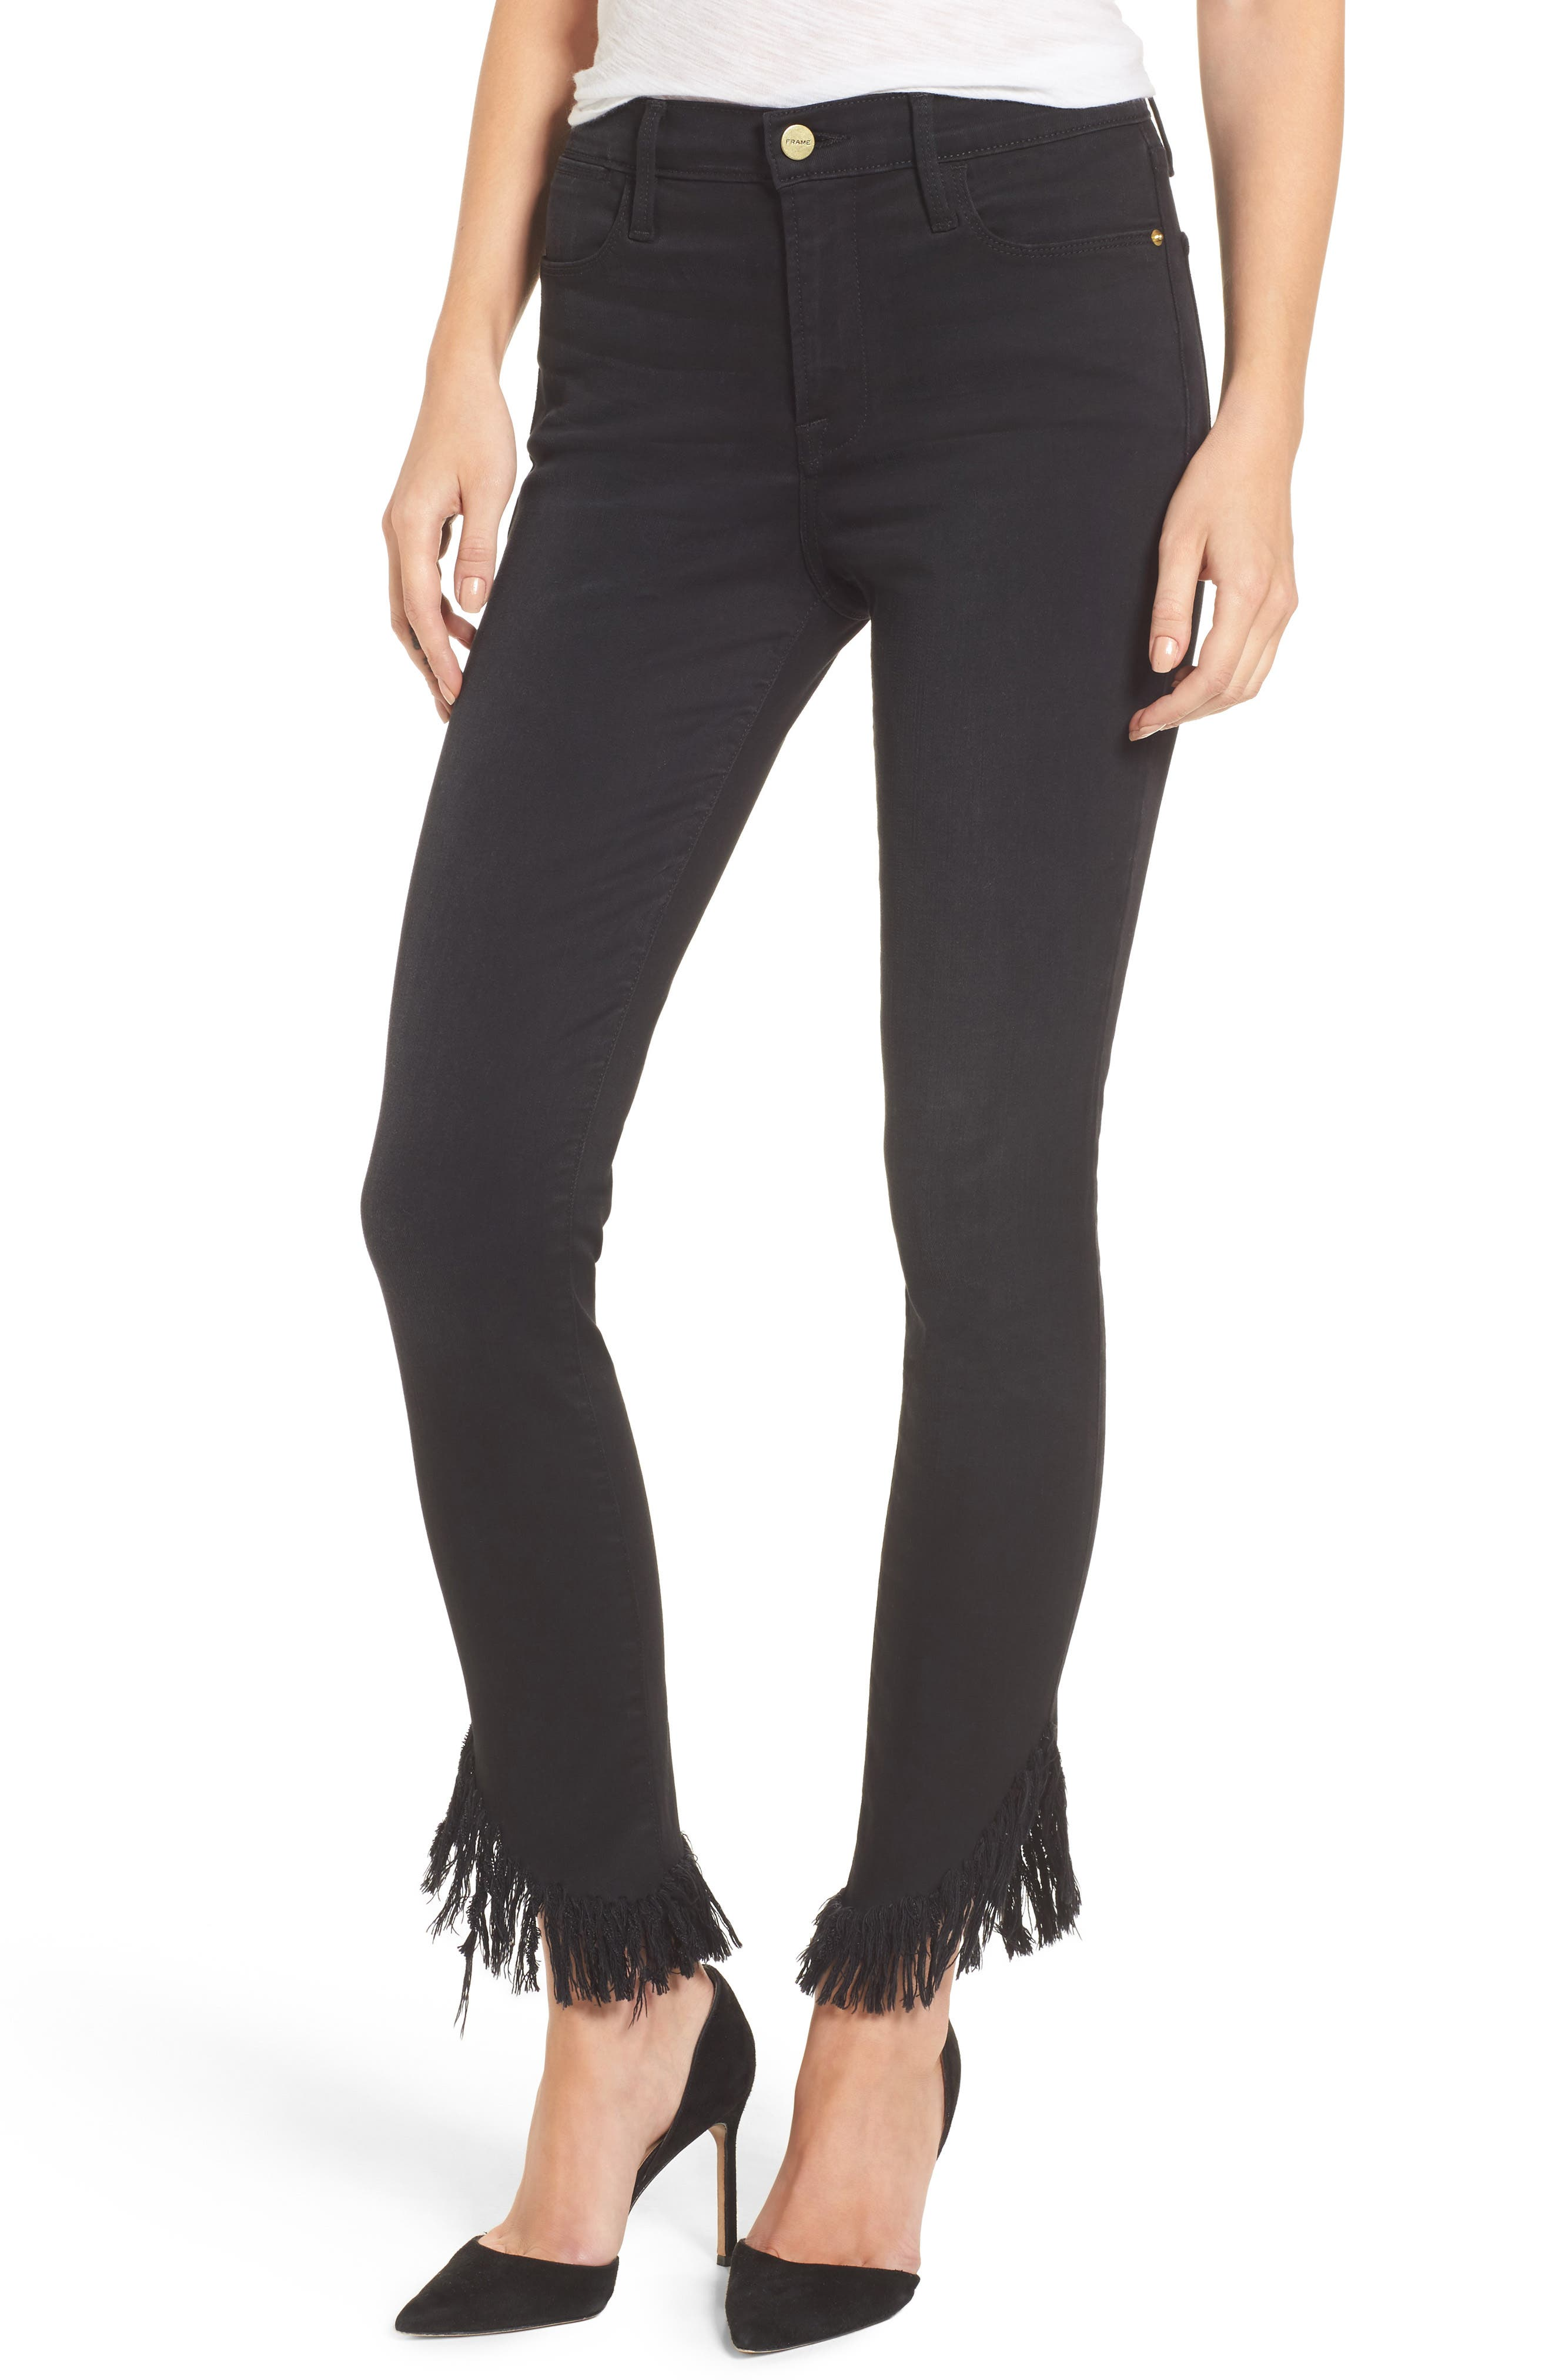 Alternate Image 1 Selected - FRAME Le High Shredded Skinny Jeans (Noir) (Nordstrom Exclusive)